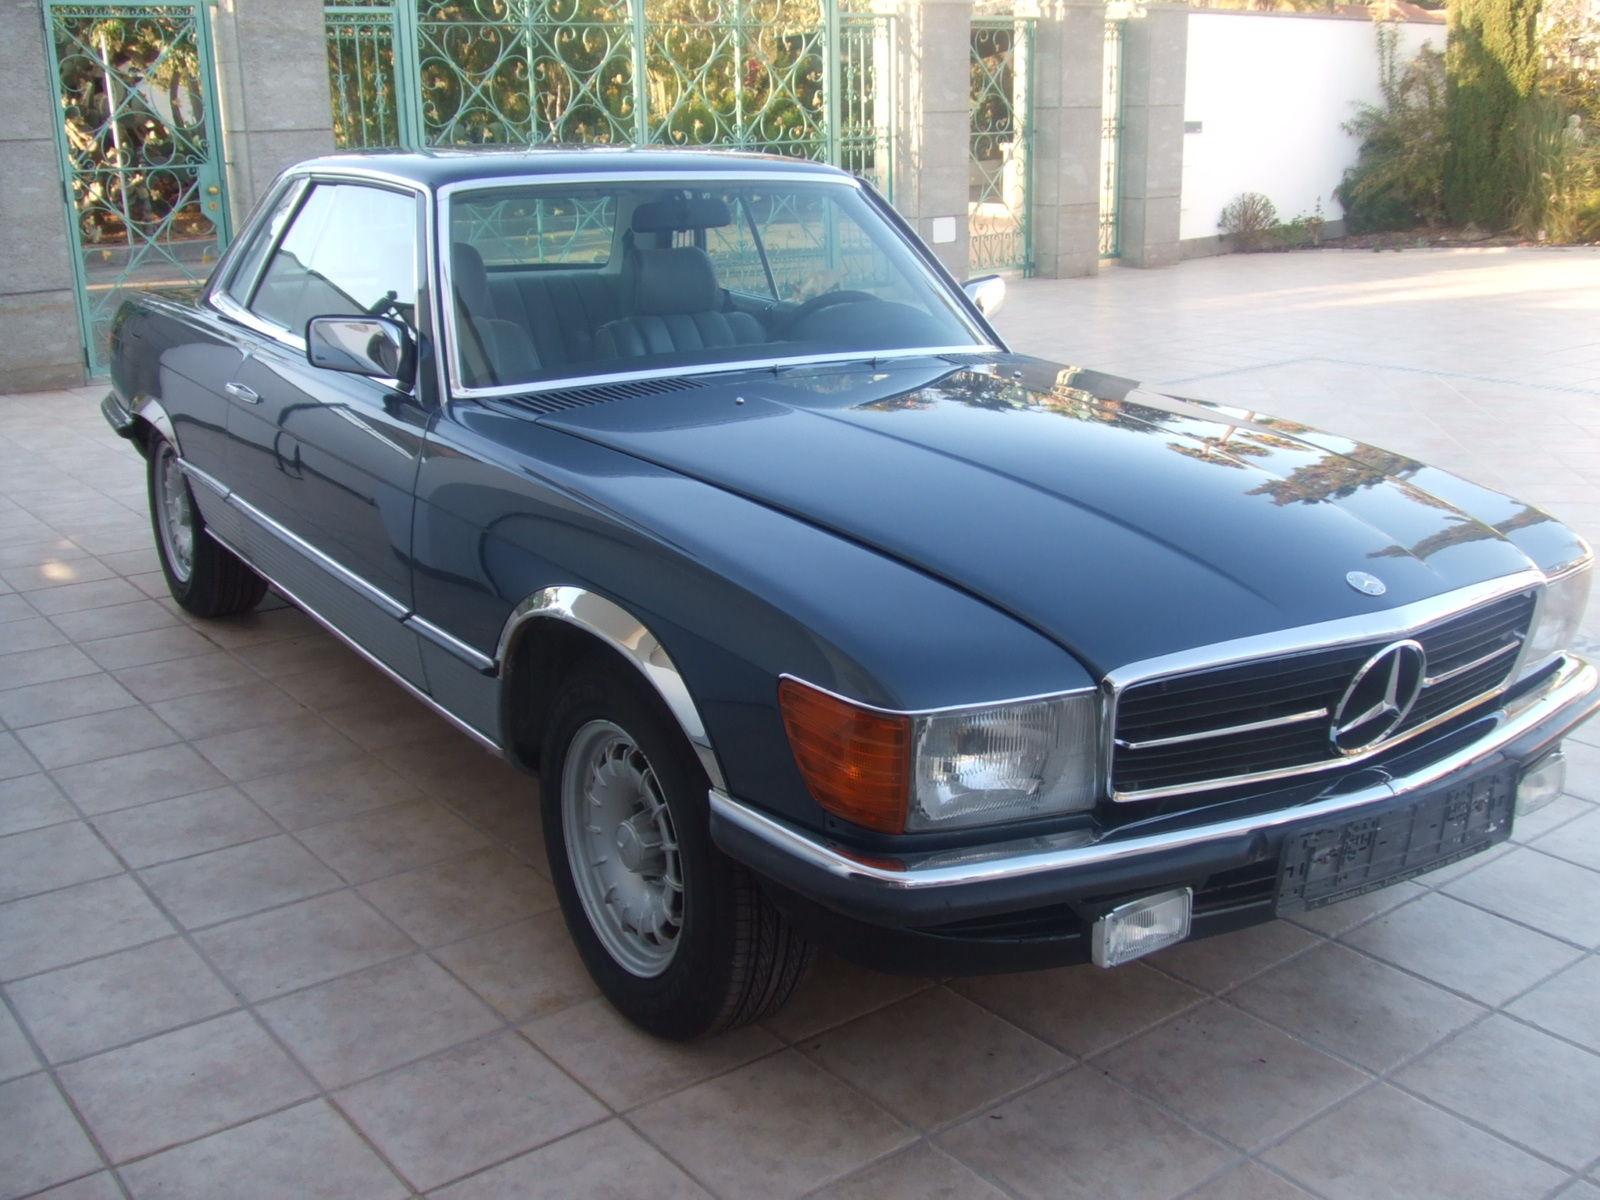 Mercedes 500 Slc 1980 Only 1000 Cars Built Topas Blue